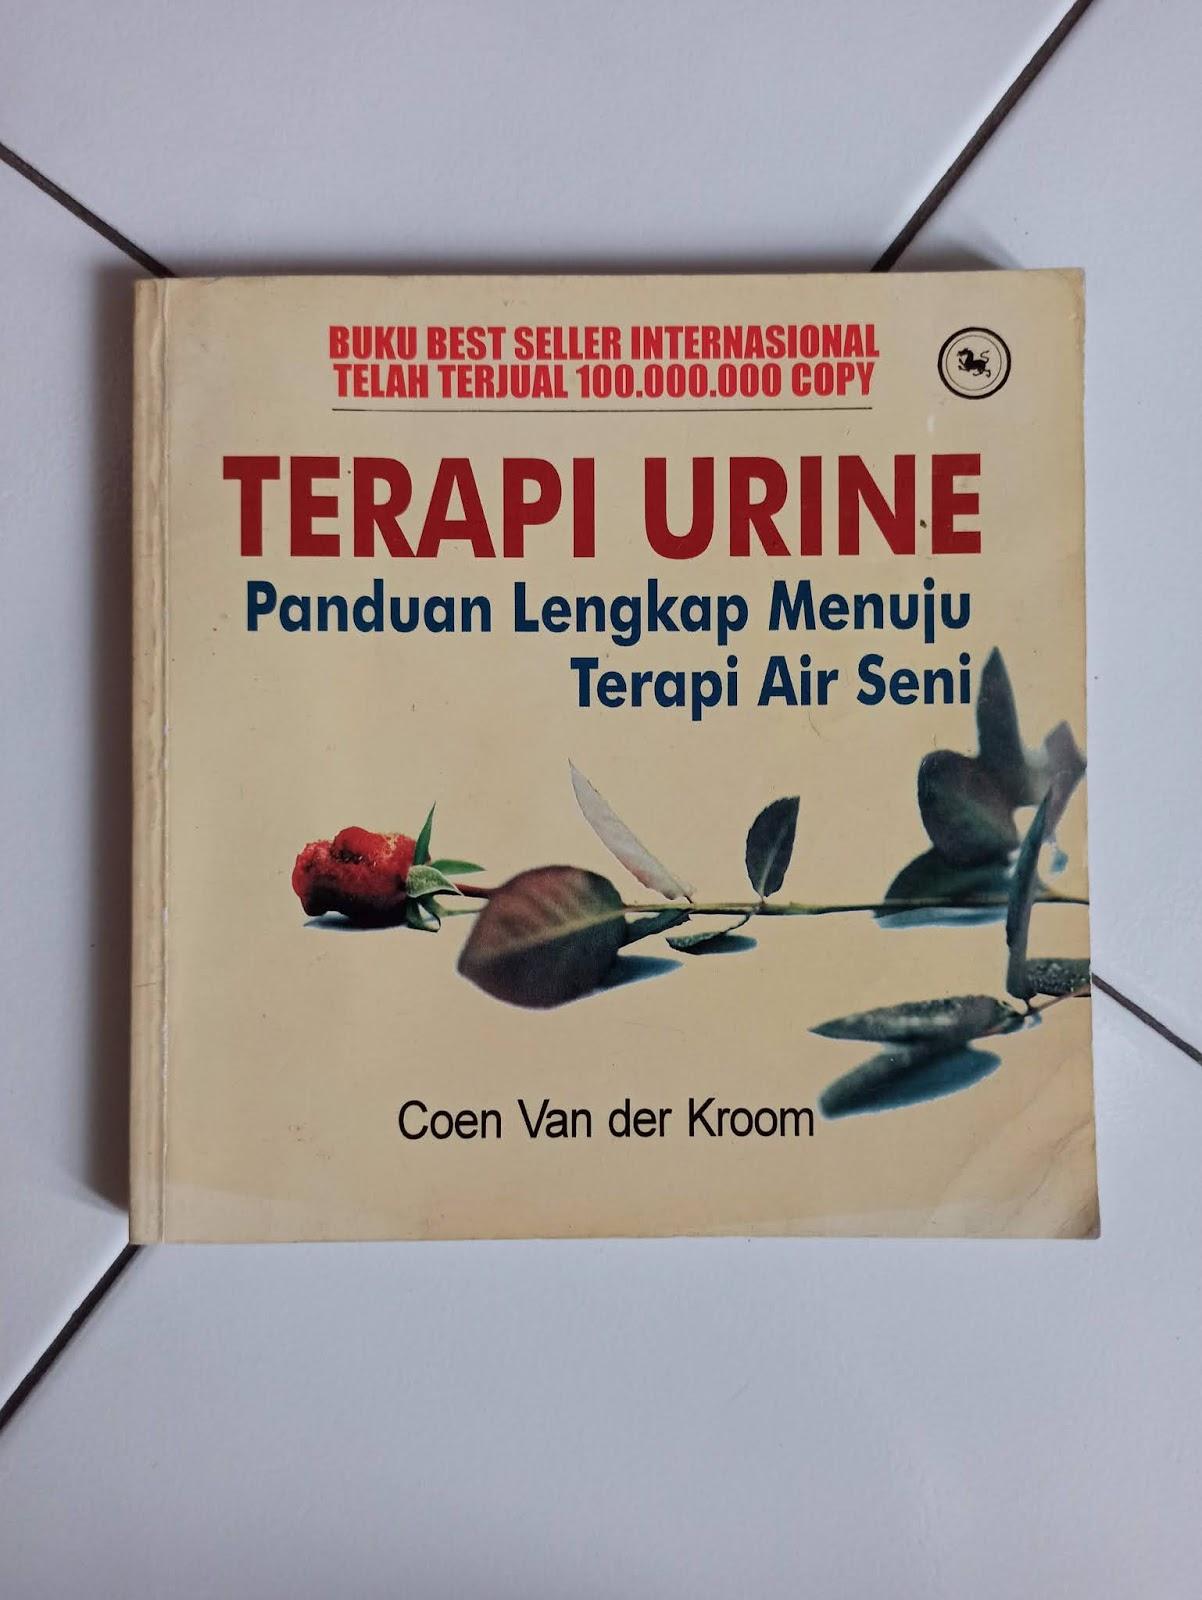 Buku Bekas Terapi Urine